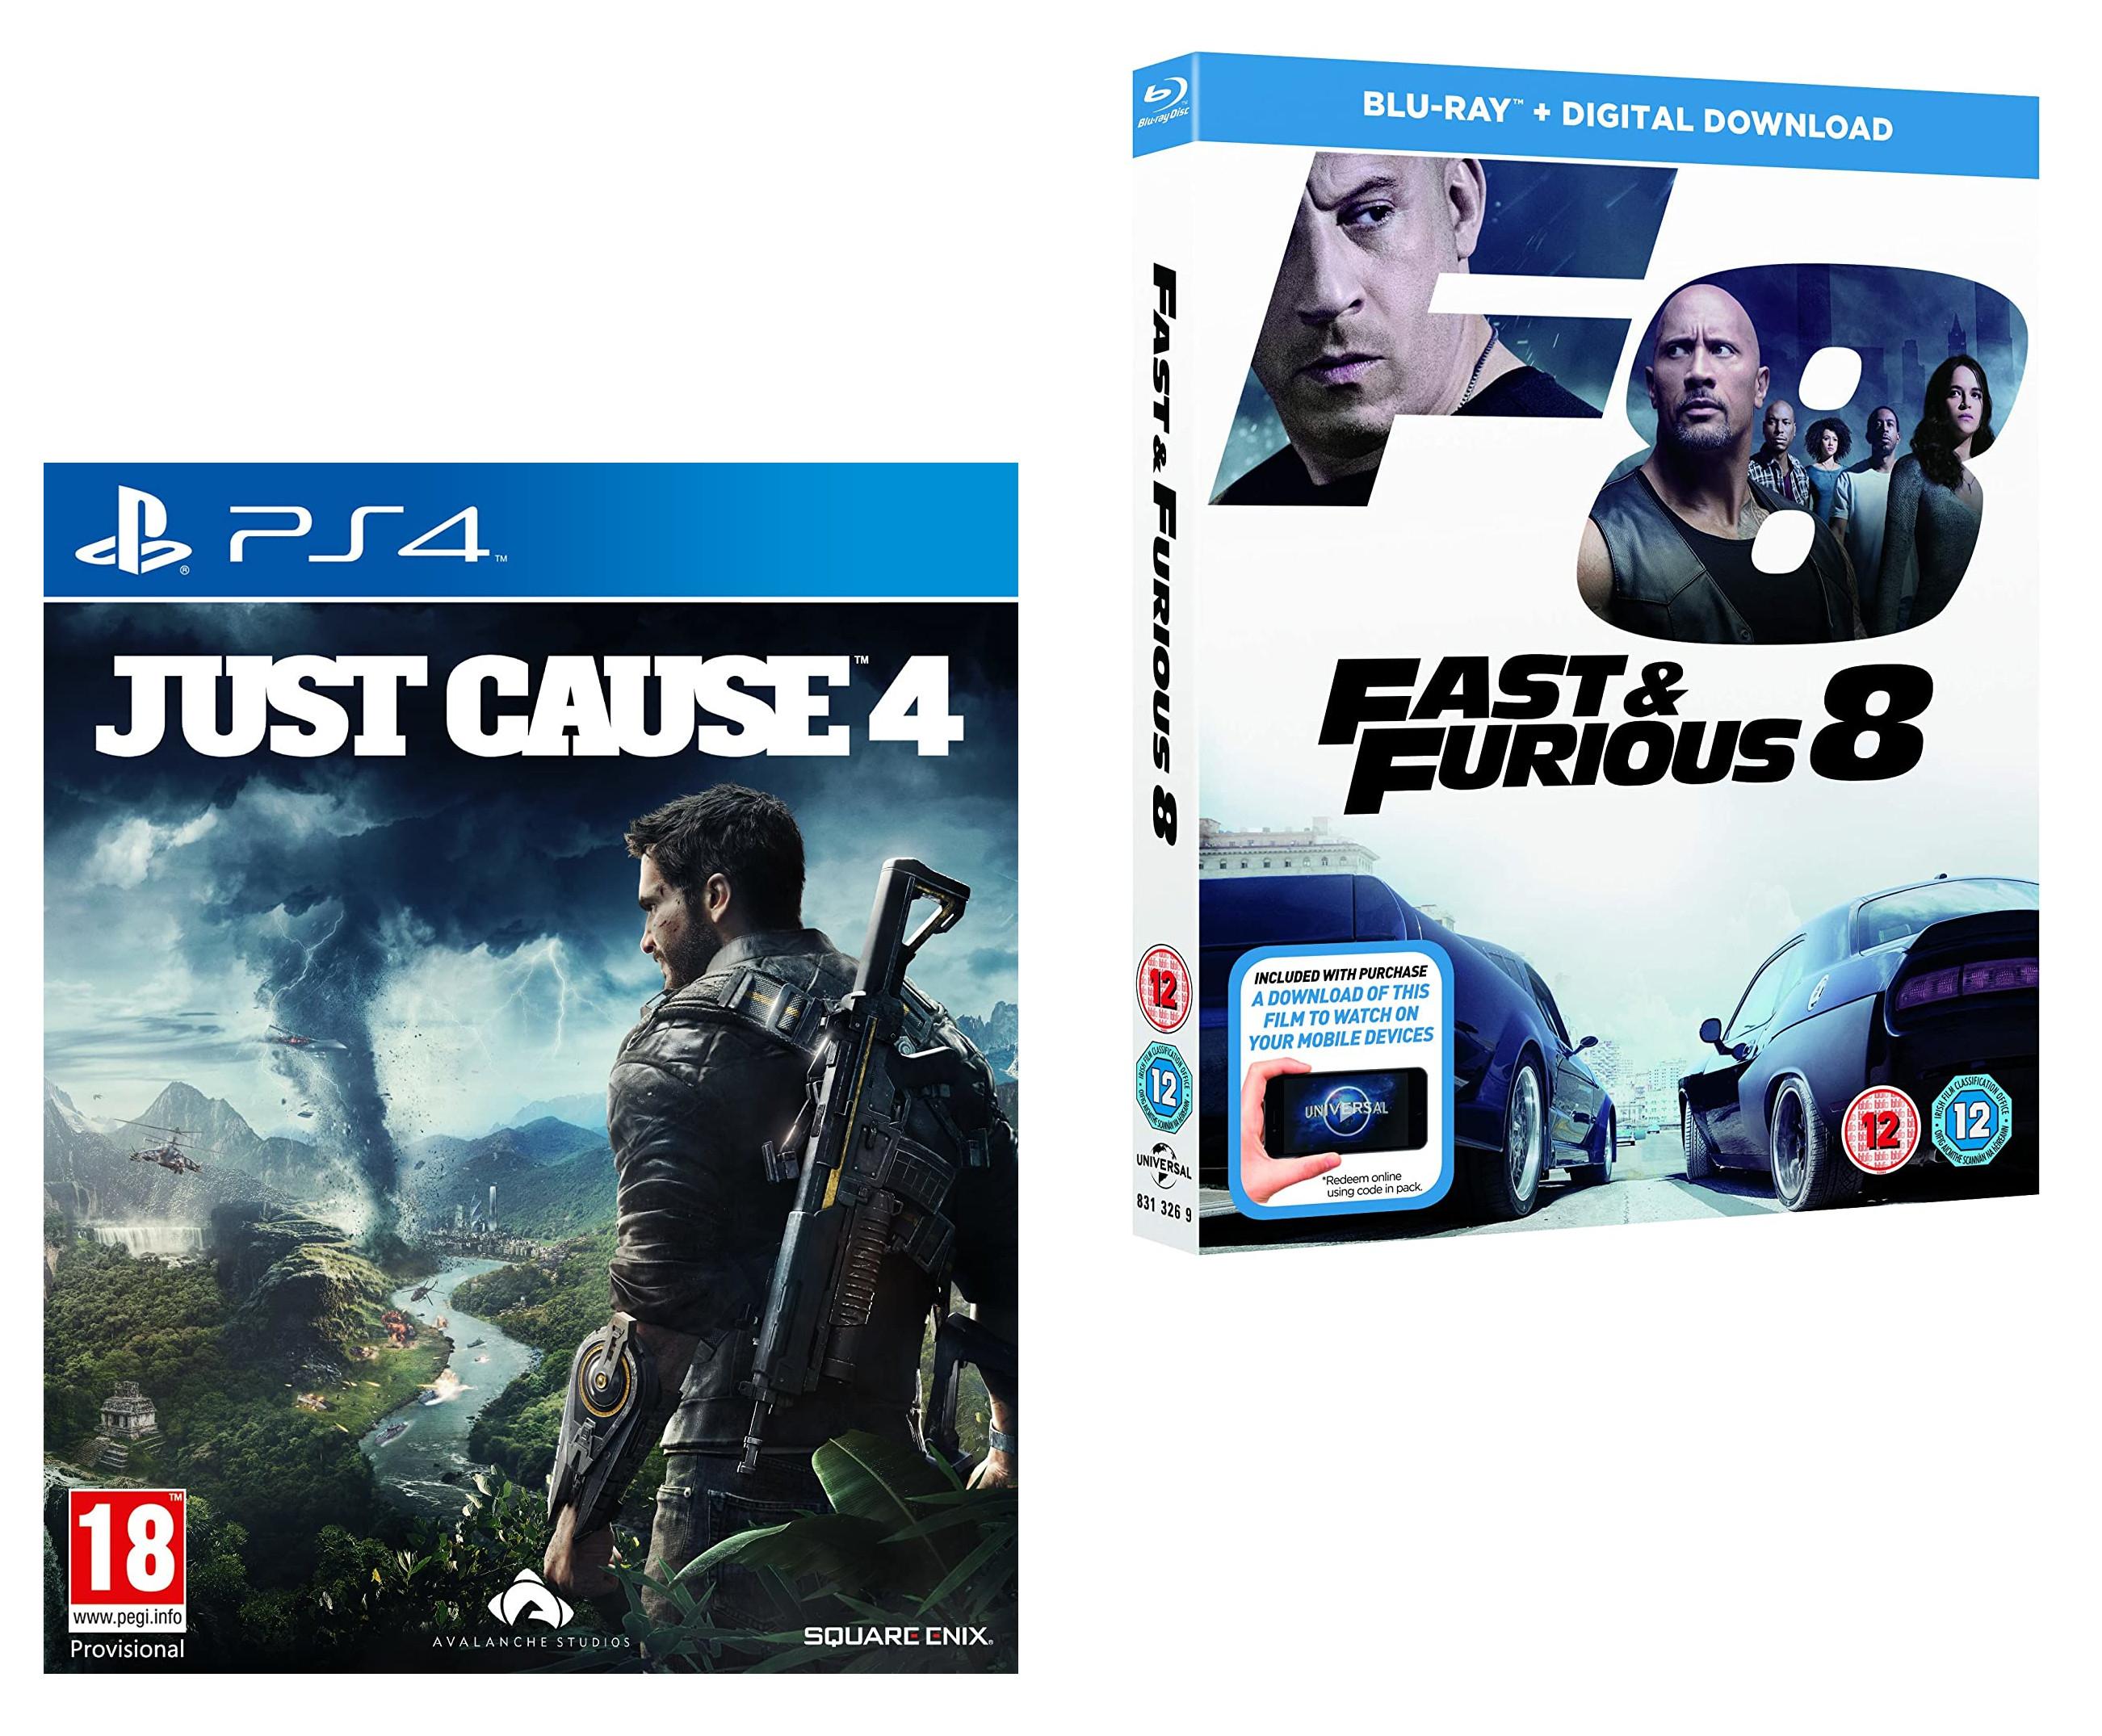 Just Cause 4 + BONUS Fast & Furious 8 Blu-Ray (Amazon Exclusive) PS4 - £9.99 (Prime) / (+£2.99 Non Prime) delivered @ Amazon